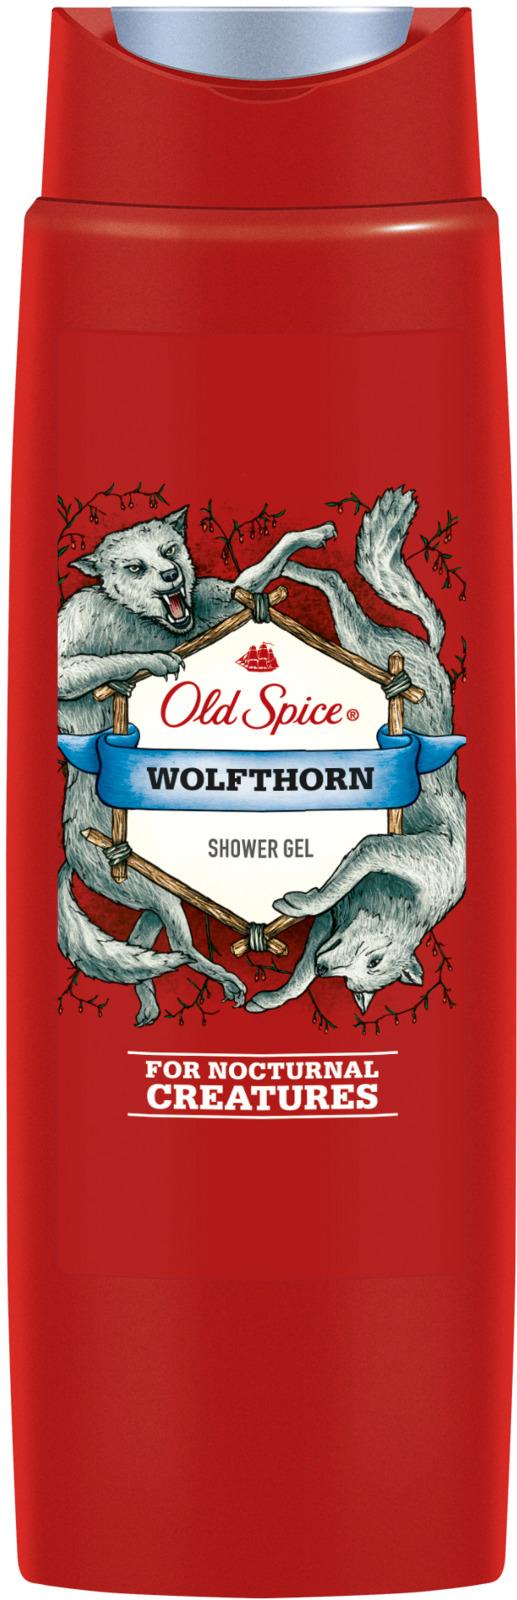 Гель для душа Old Spice Wolfthorn, 250 мл